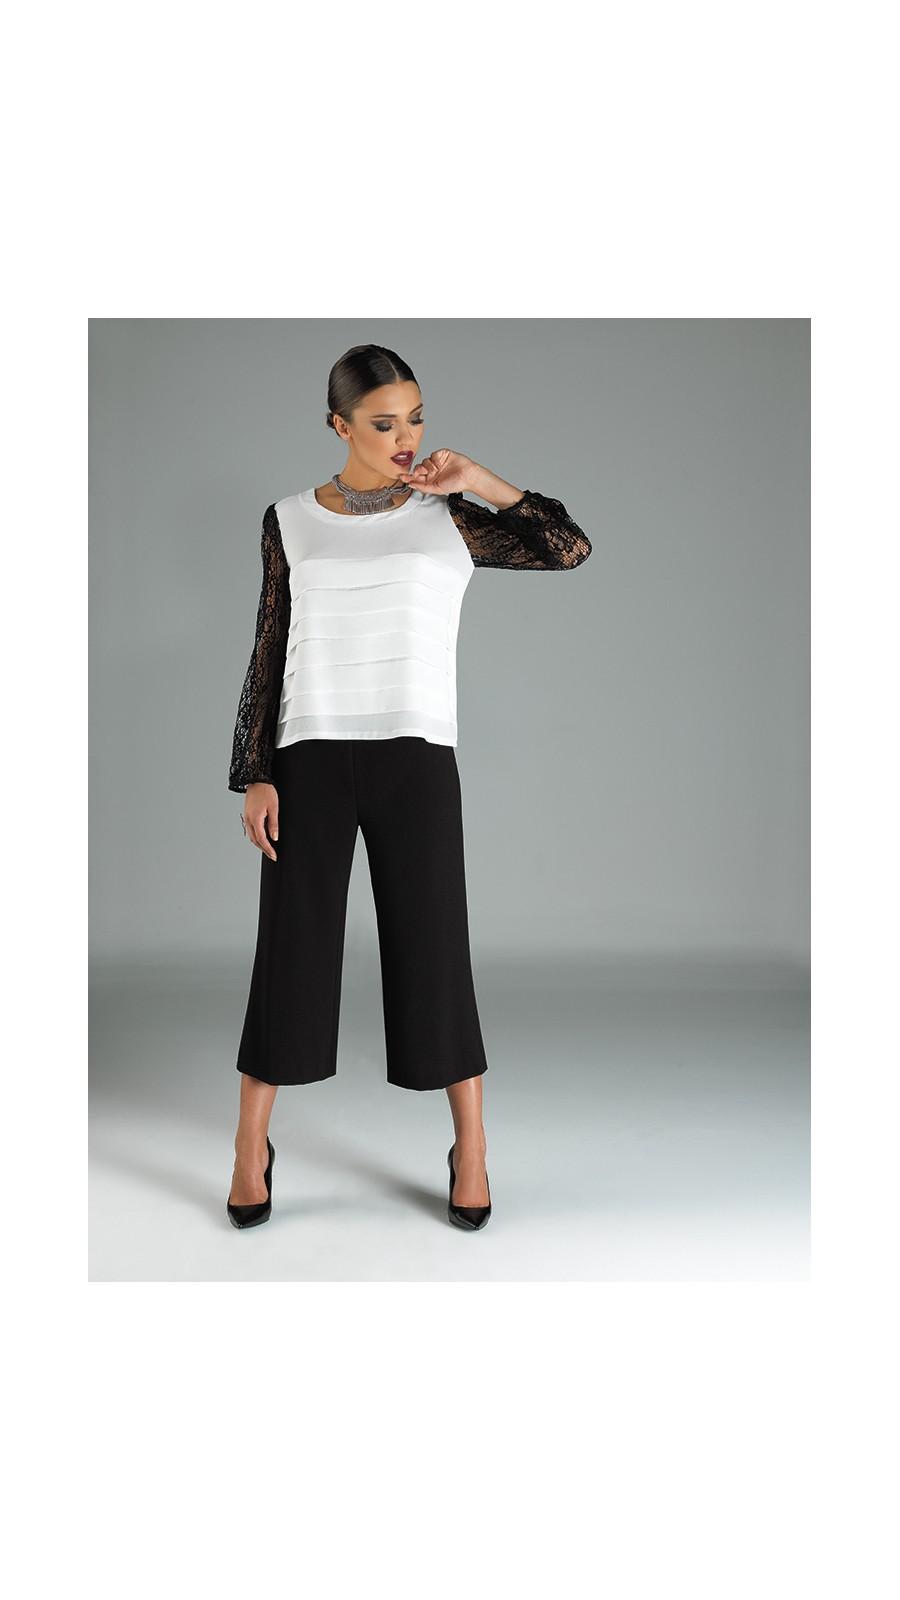 d8dc15a051e0 Παντελόνα κρέπ - Open Fashion